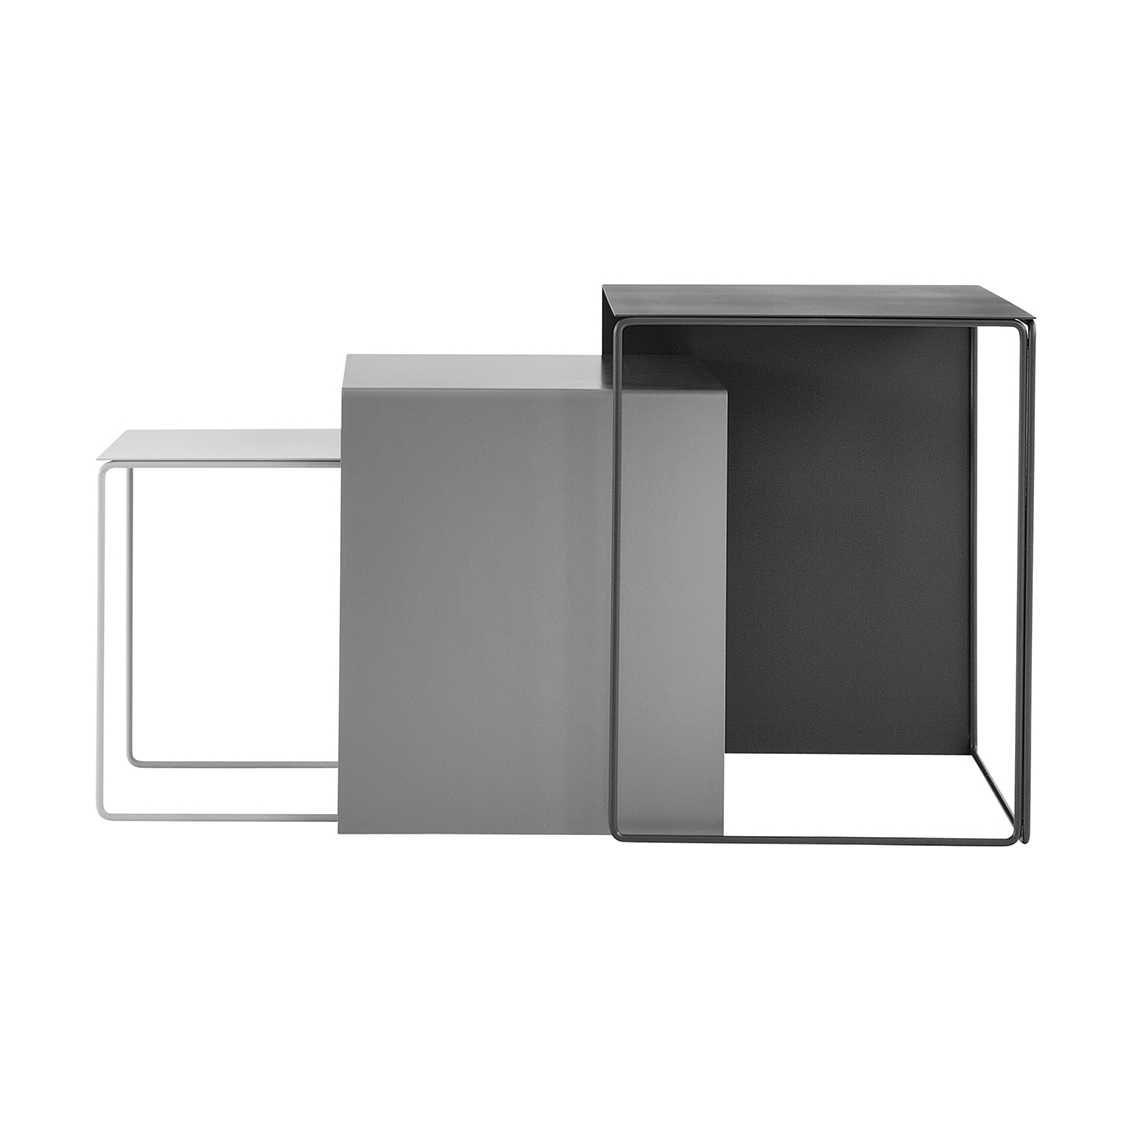 Muebles Jouannet - Ferm Living Cluster Tafels Slaapkamer Pinterest[mjhdah]https://s-media-cache-ak0.pinimg.com/originals/f2/55/01/f255012f9cbfd2b61a4353cdd6d26f32.jpg